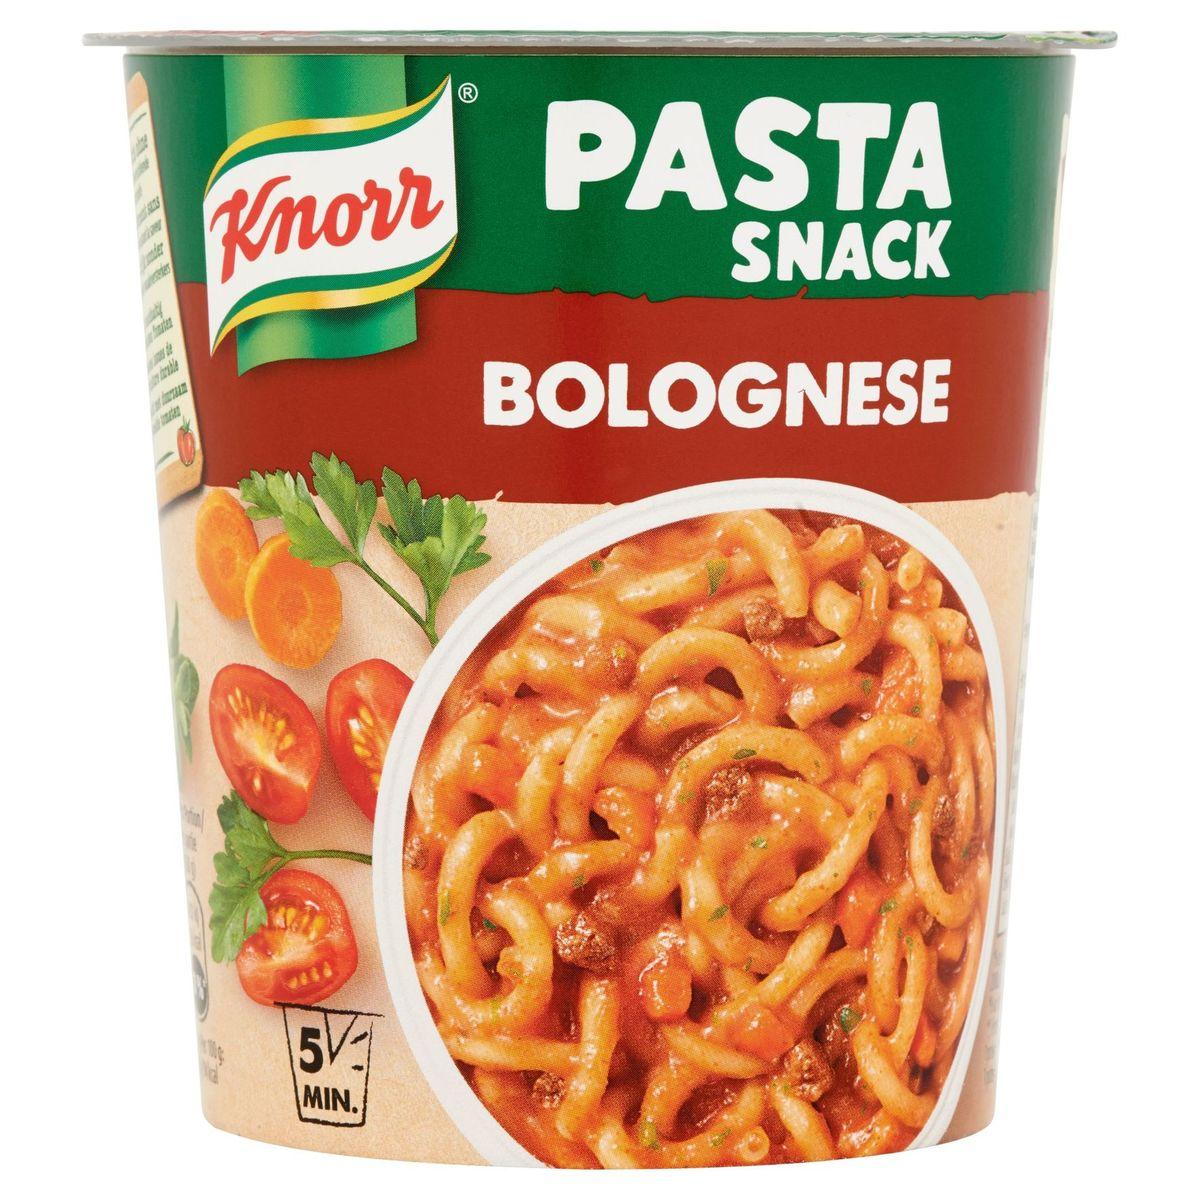 Knorr Instant Snack Pasta Bolognese 68 g